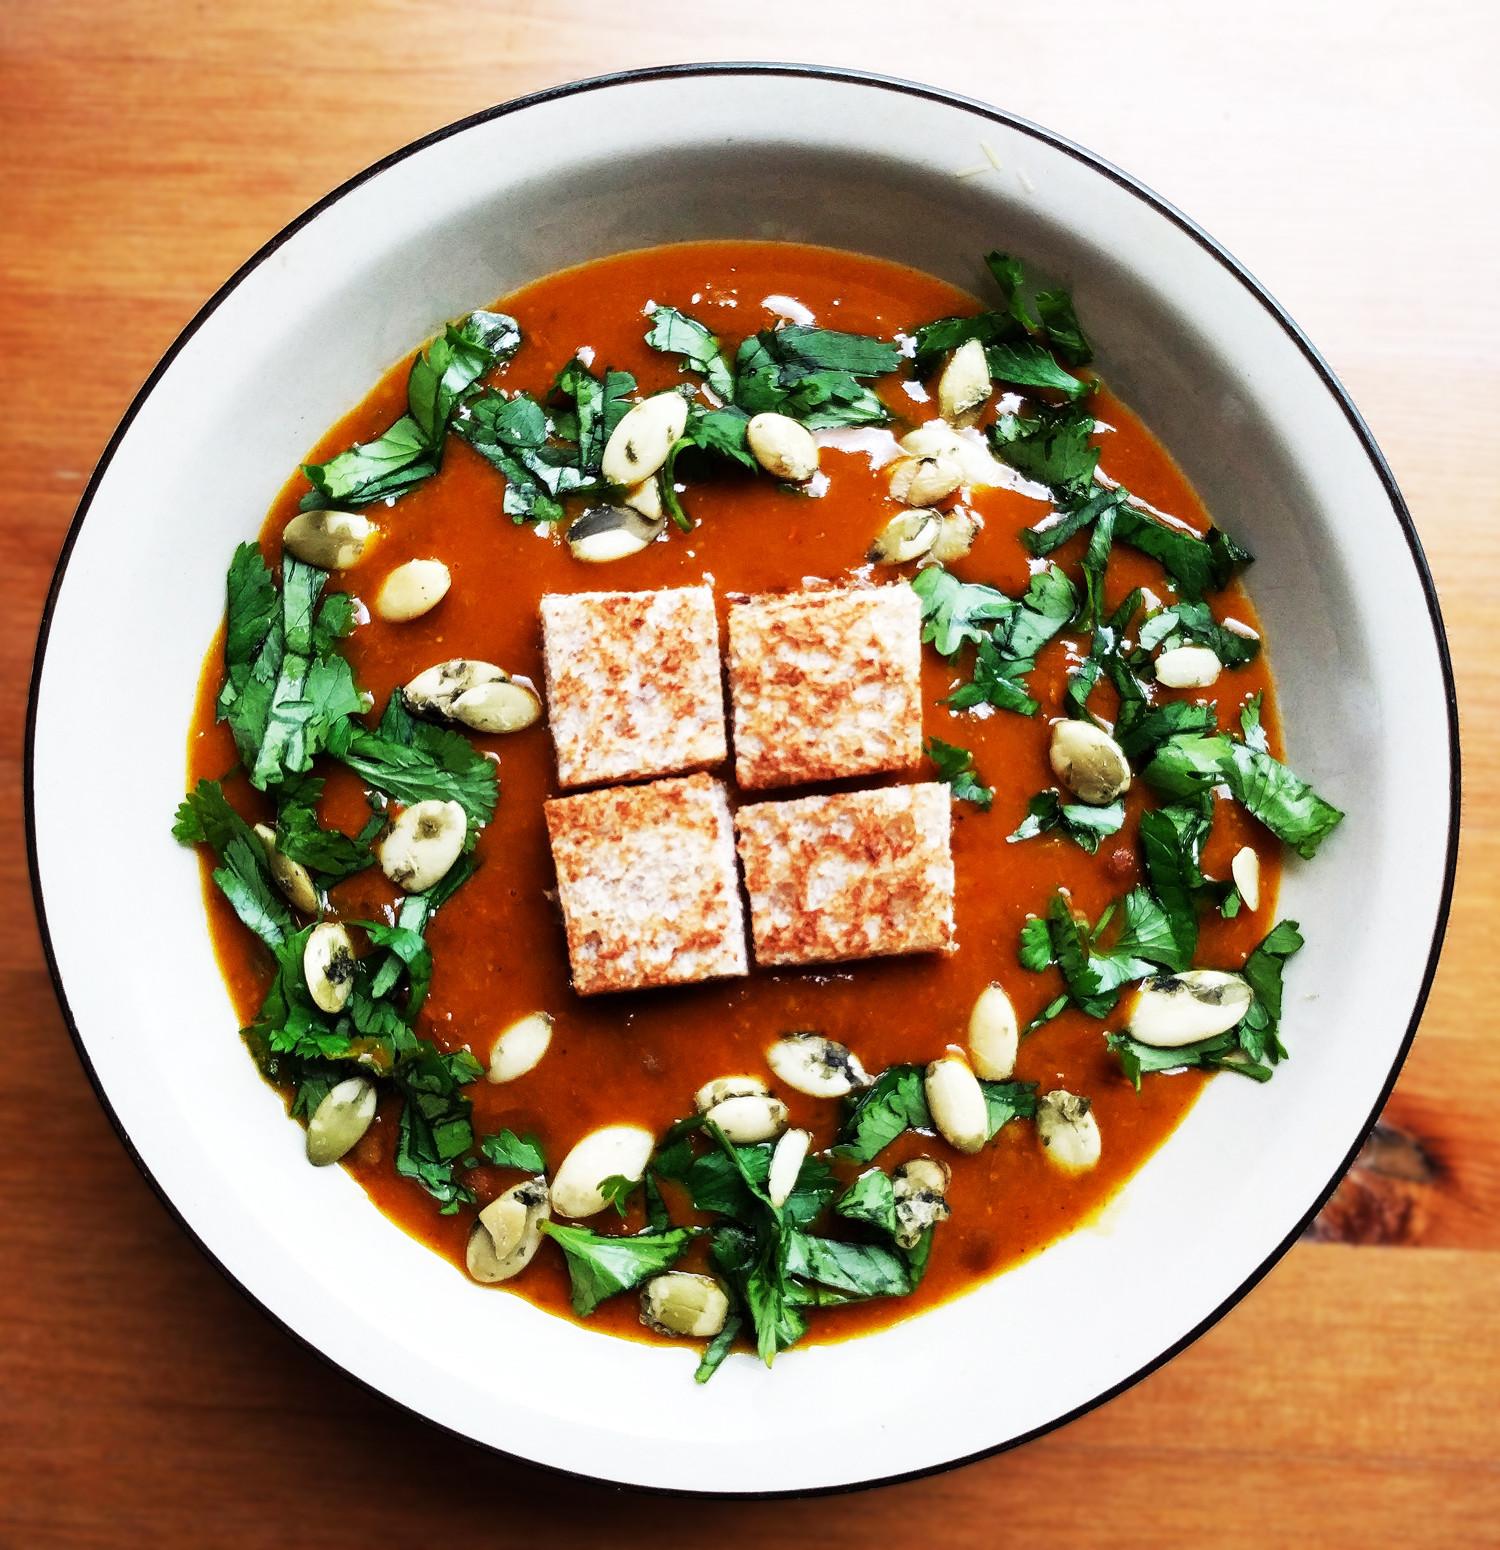 Healthy Kidney Bean Recipes  Kidney Bean Soup Recipe